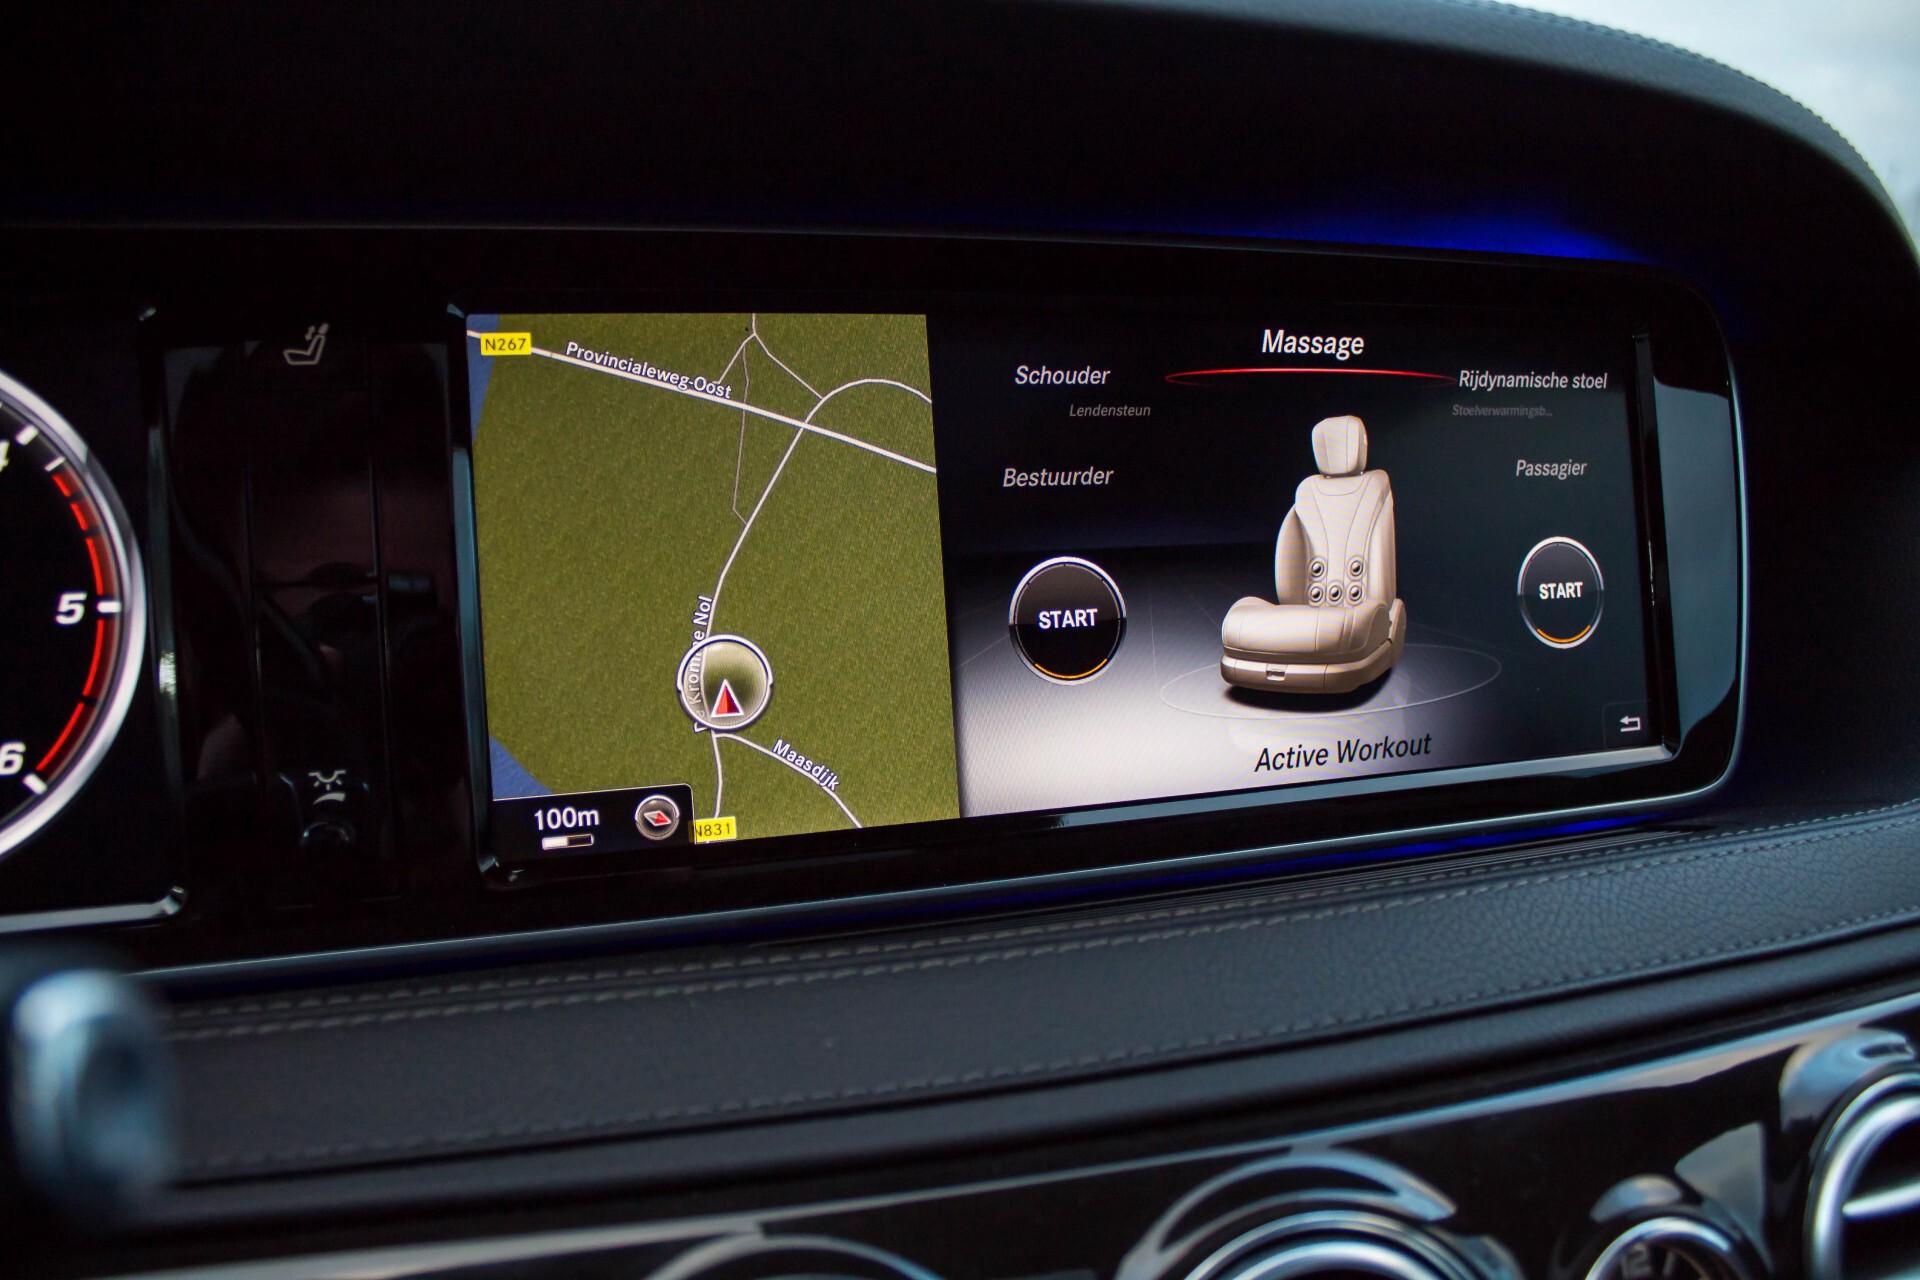 Mercedes-Benz S-Klasse 350 BlueTEC 63 AMG Panorama/Distronic/Keyless/Massage/Burmester Aut7 Foto 11